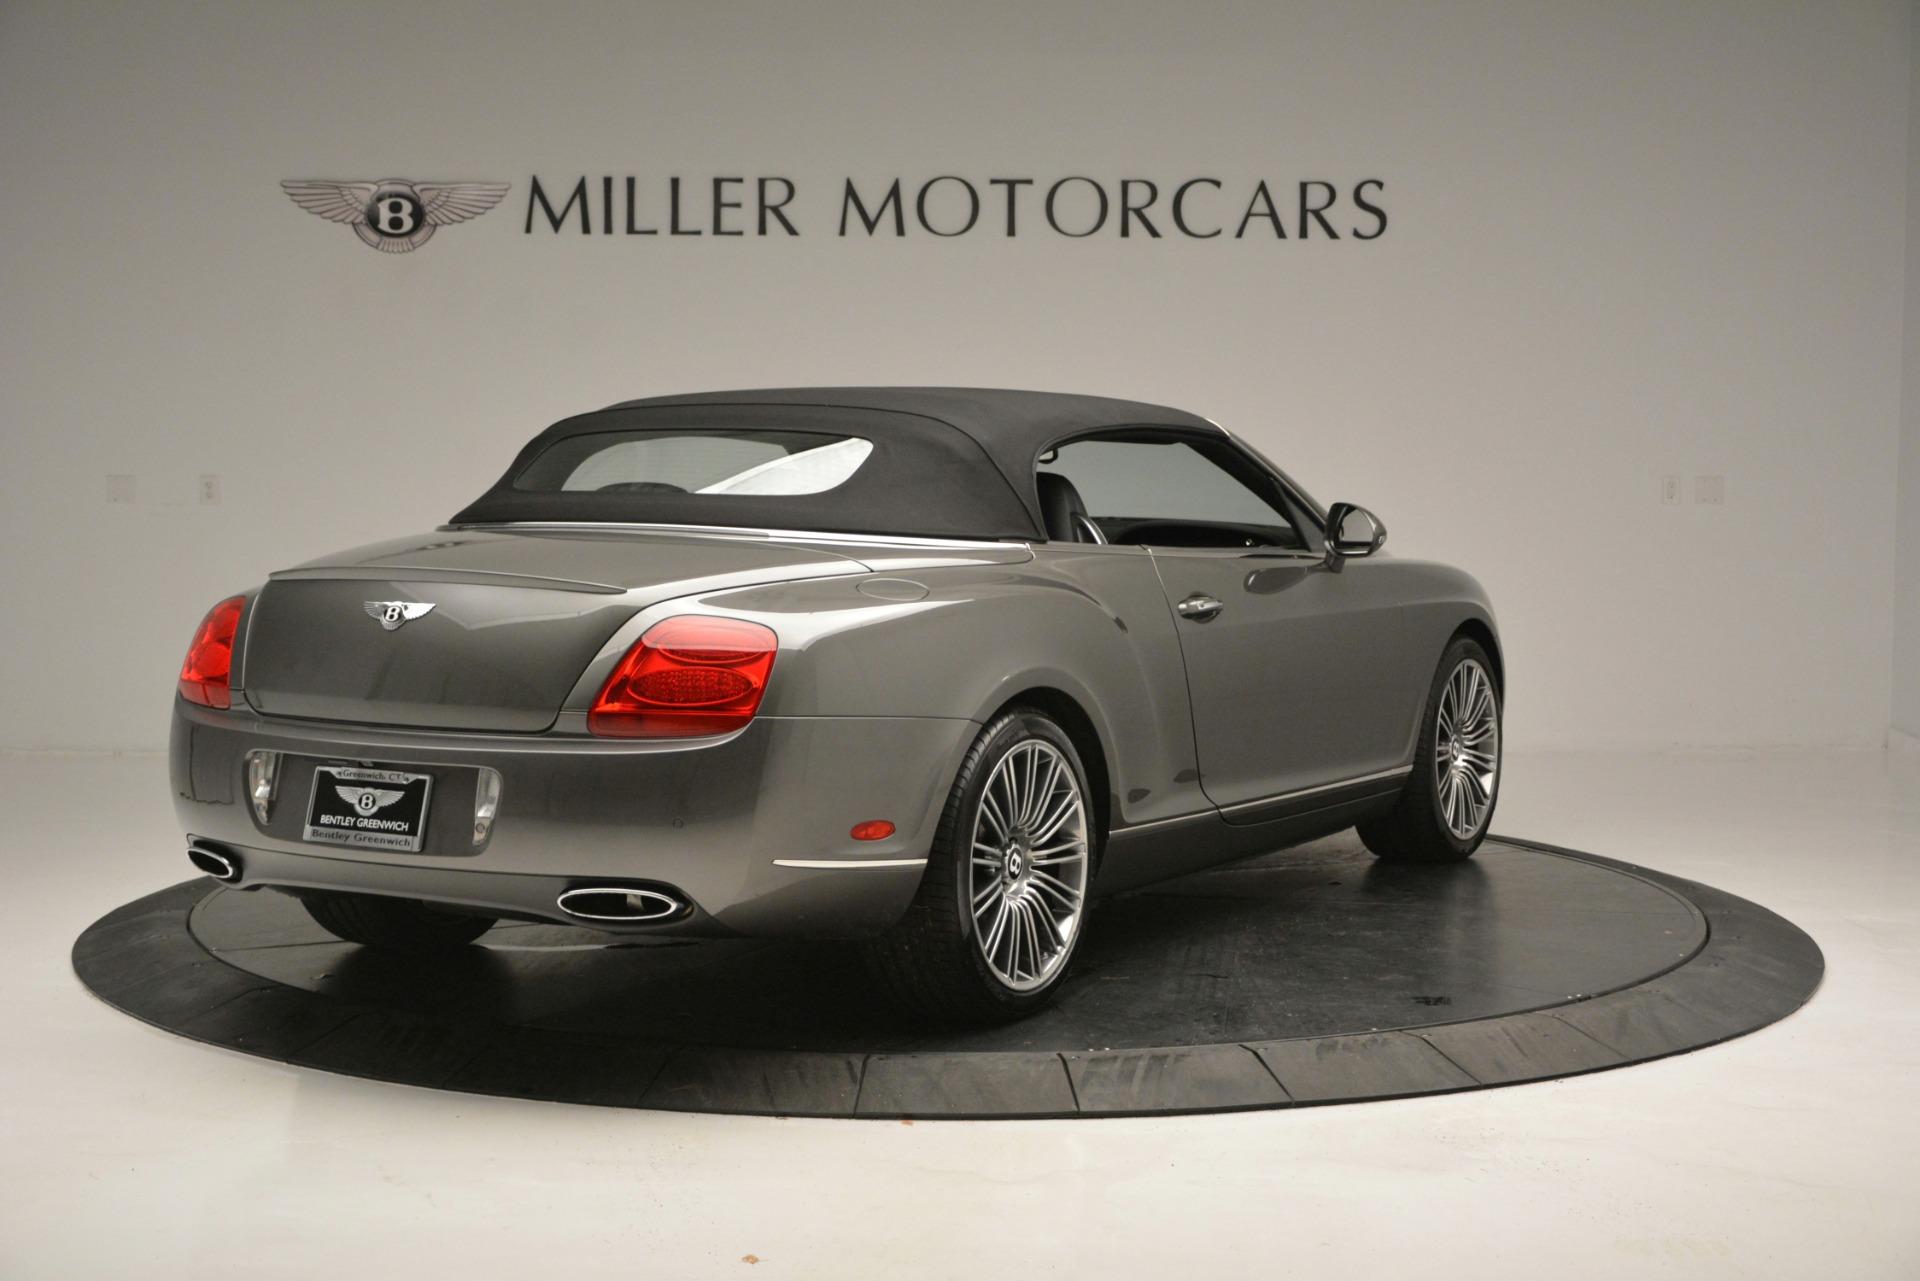 Used 2010 Bentley Continental GT Speed For Sale In Westport, CT 2677_p15